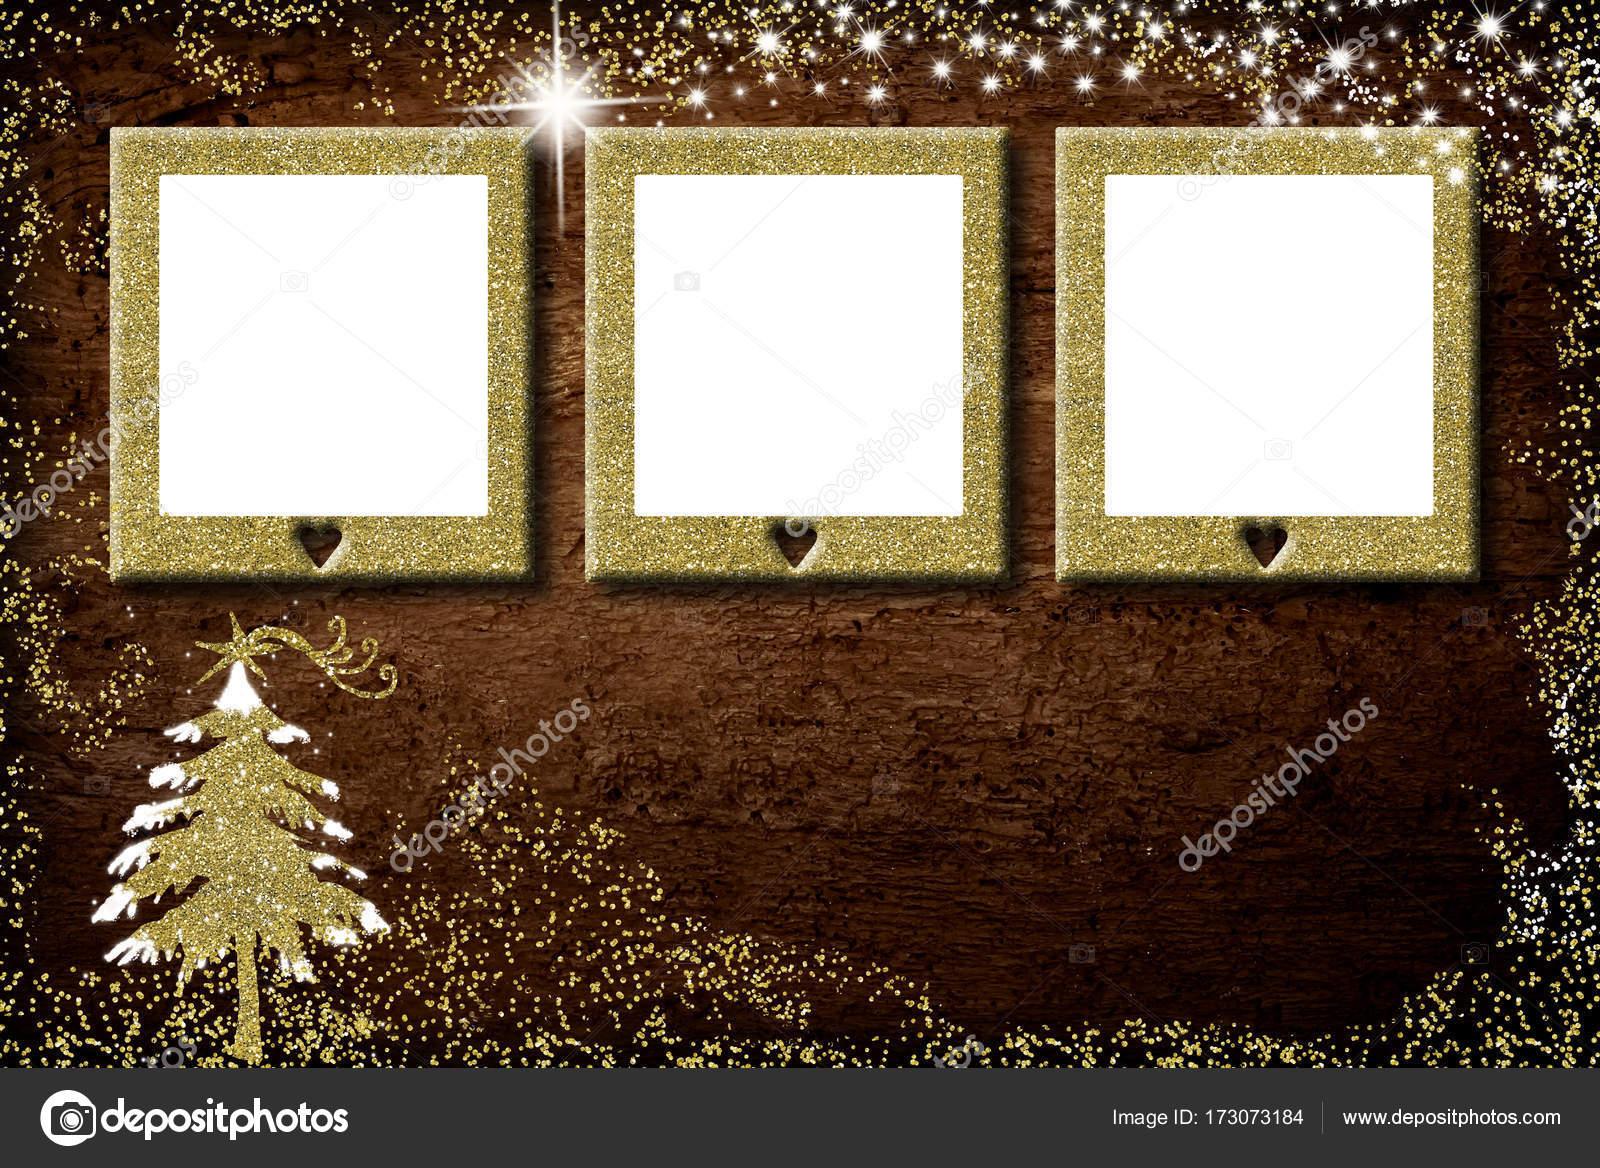 Weihnachten 3 leere Frames Fotokarte — Stockfoto © Risia #173073184